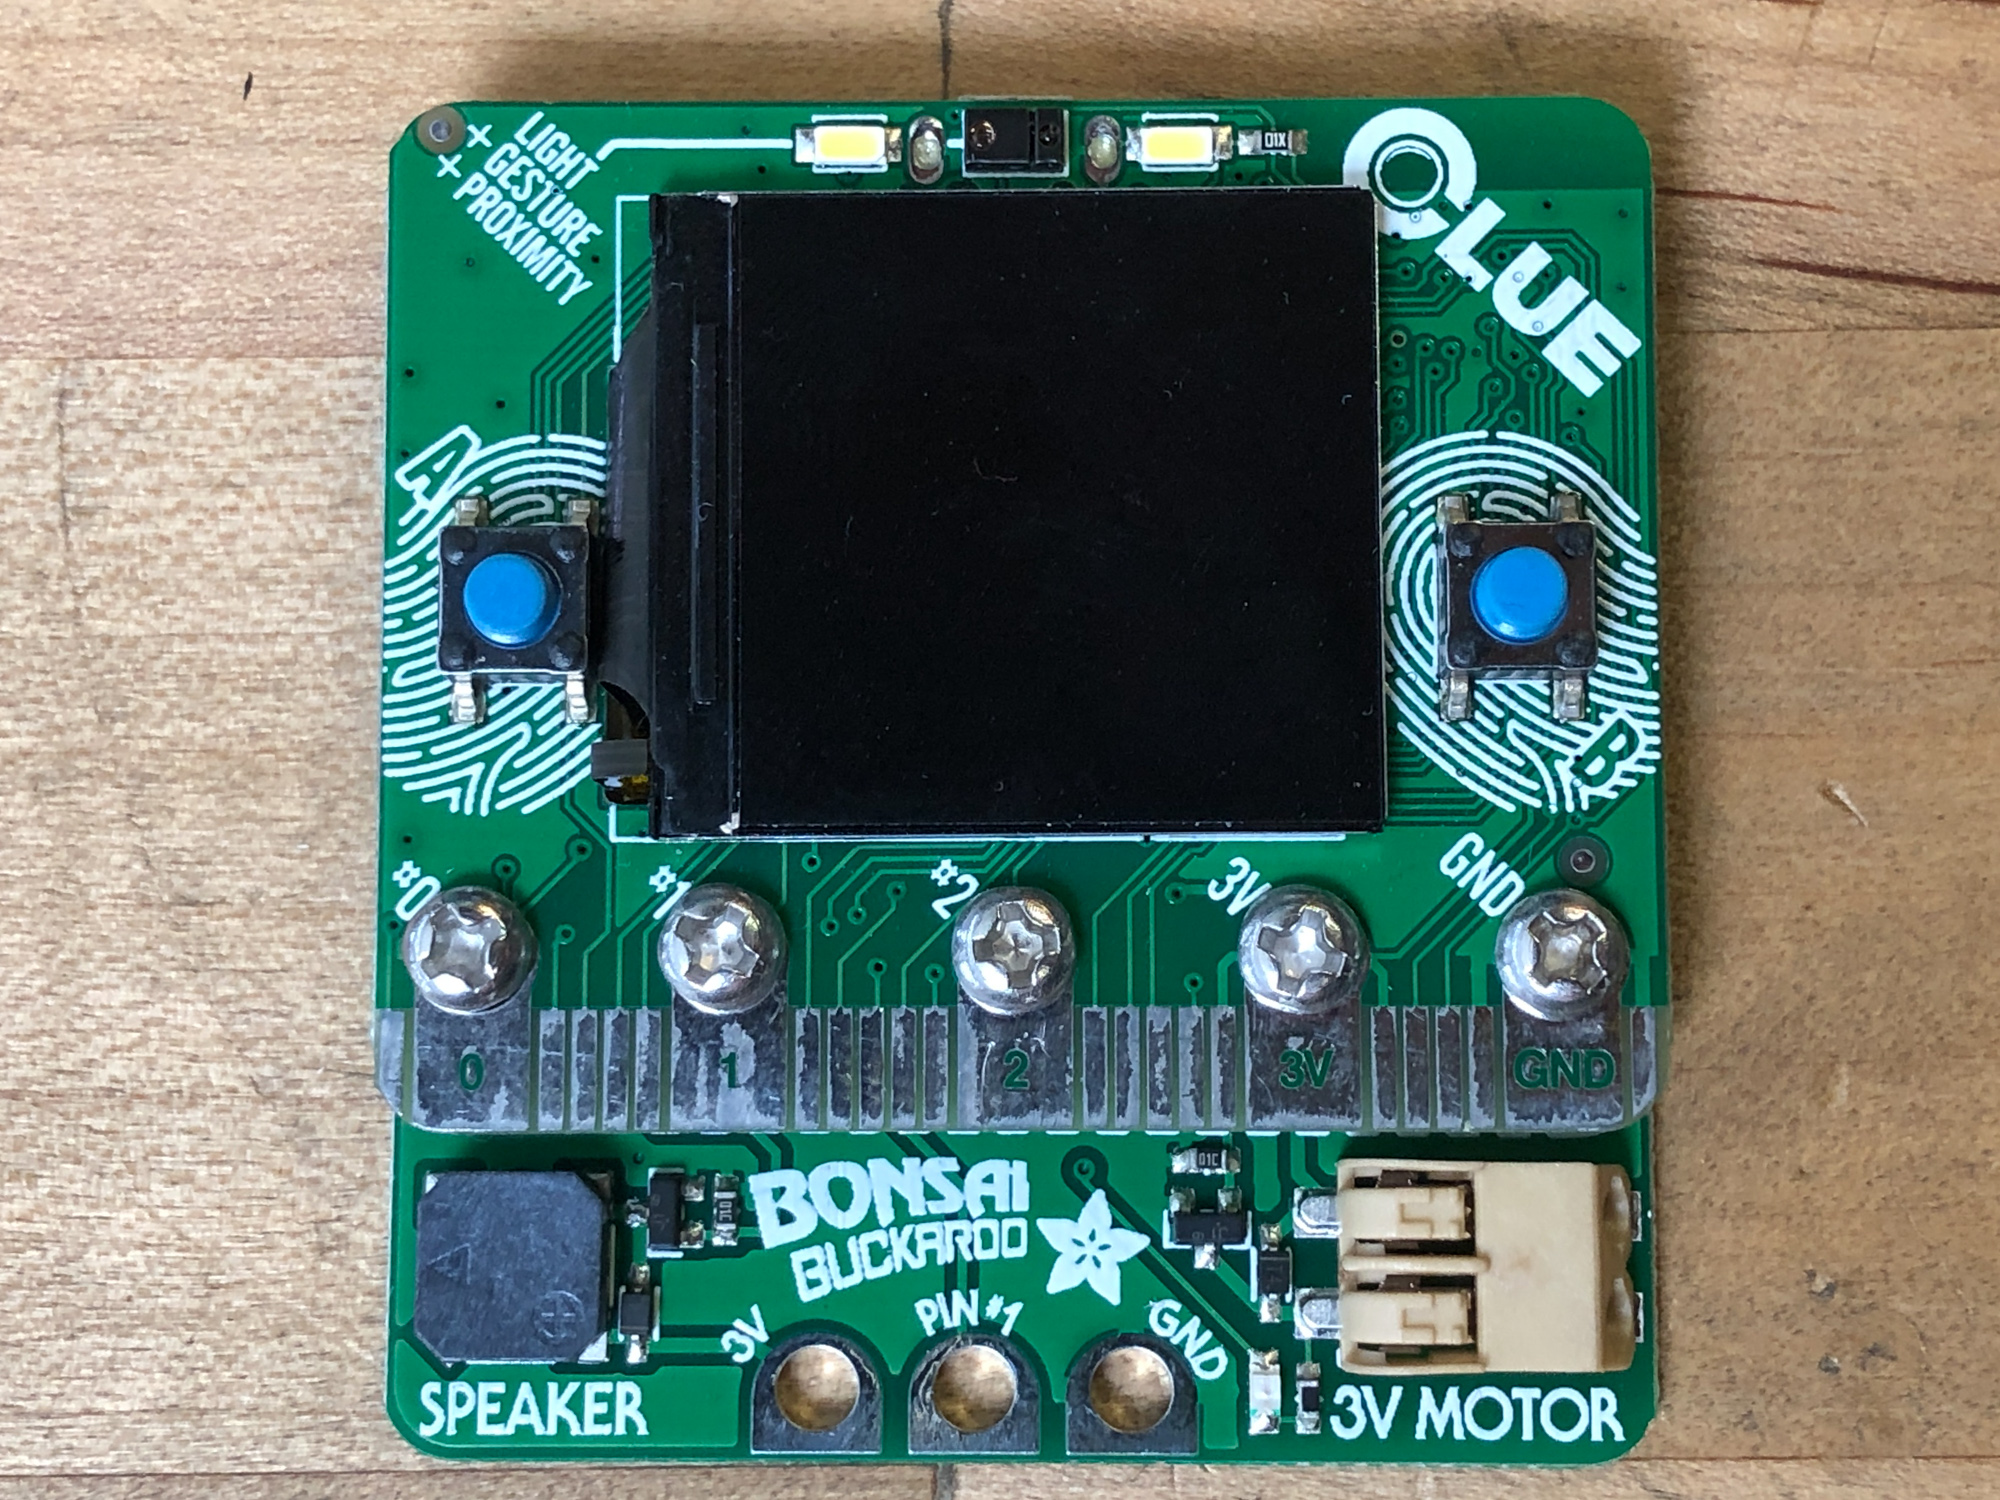 sensors_plant-1292.jpg